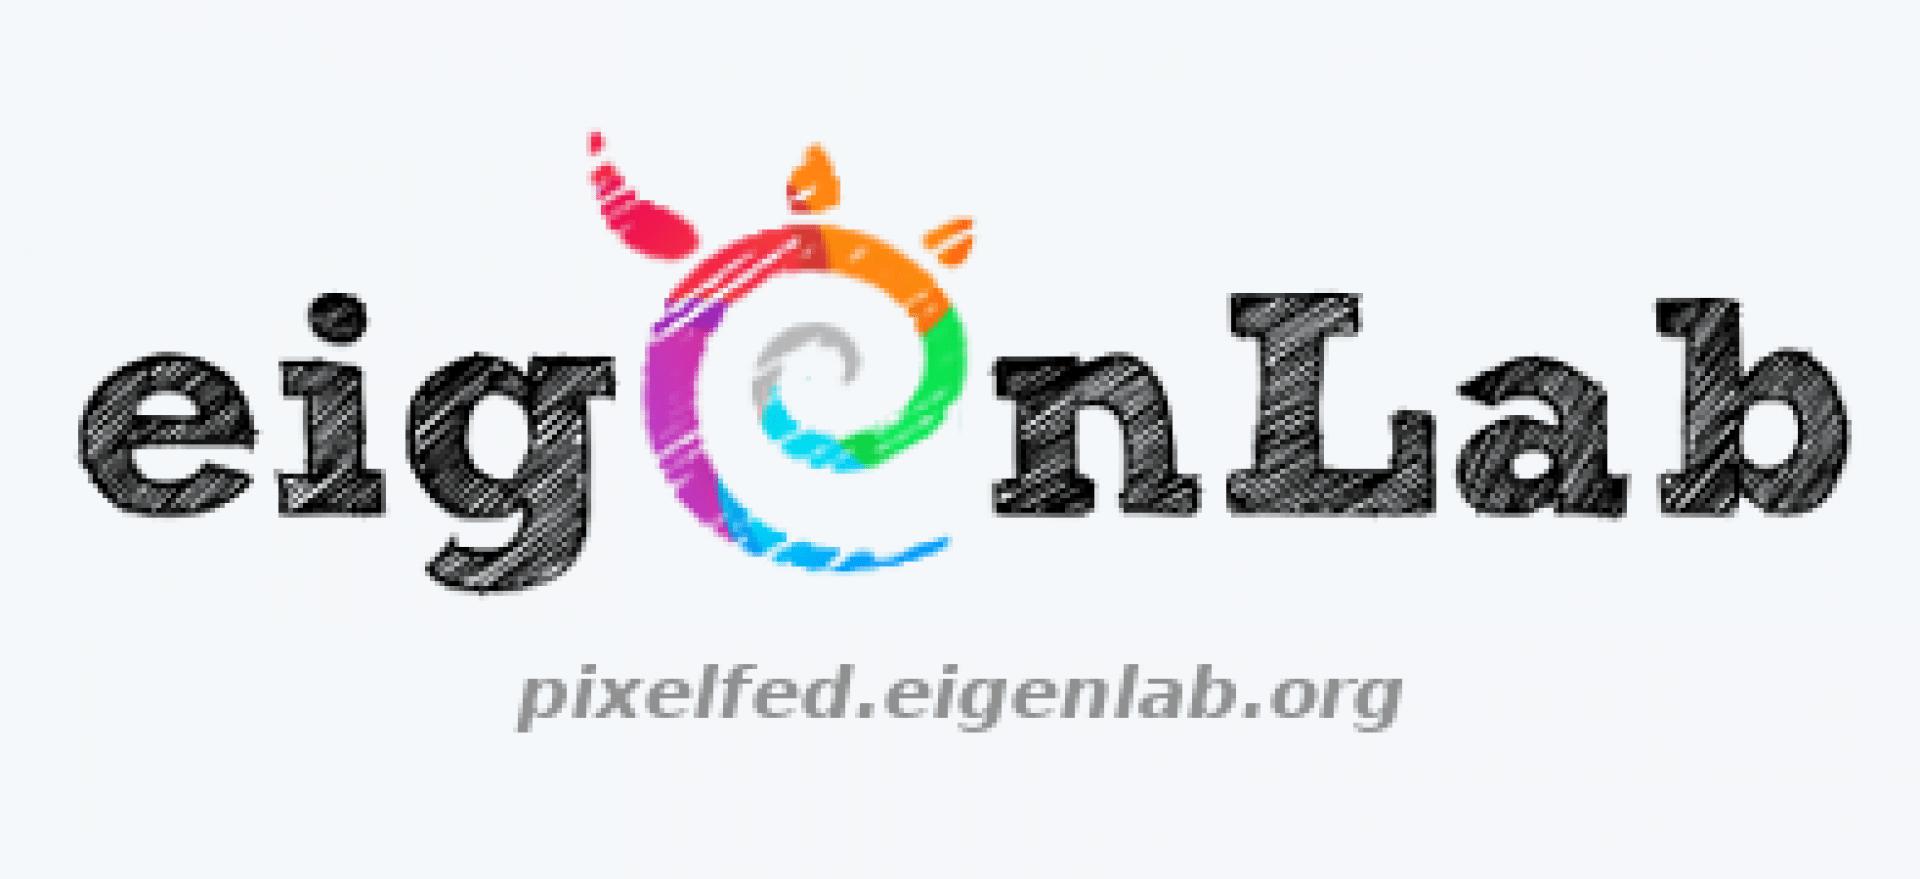 eigenPixelfed logo